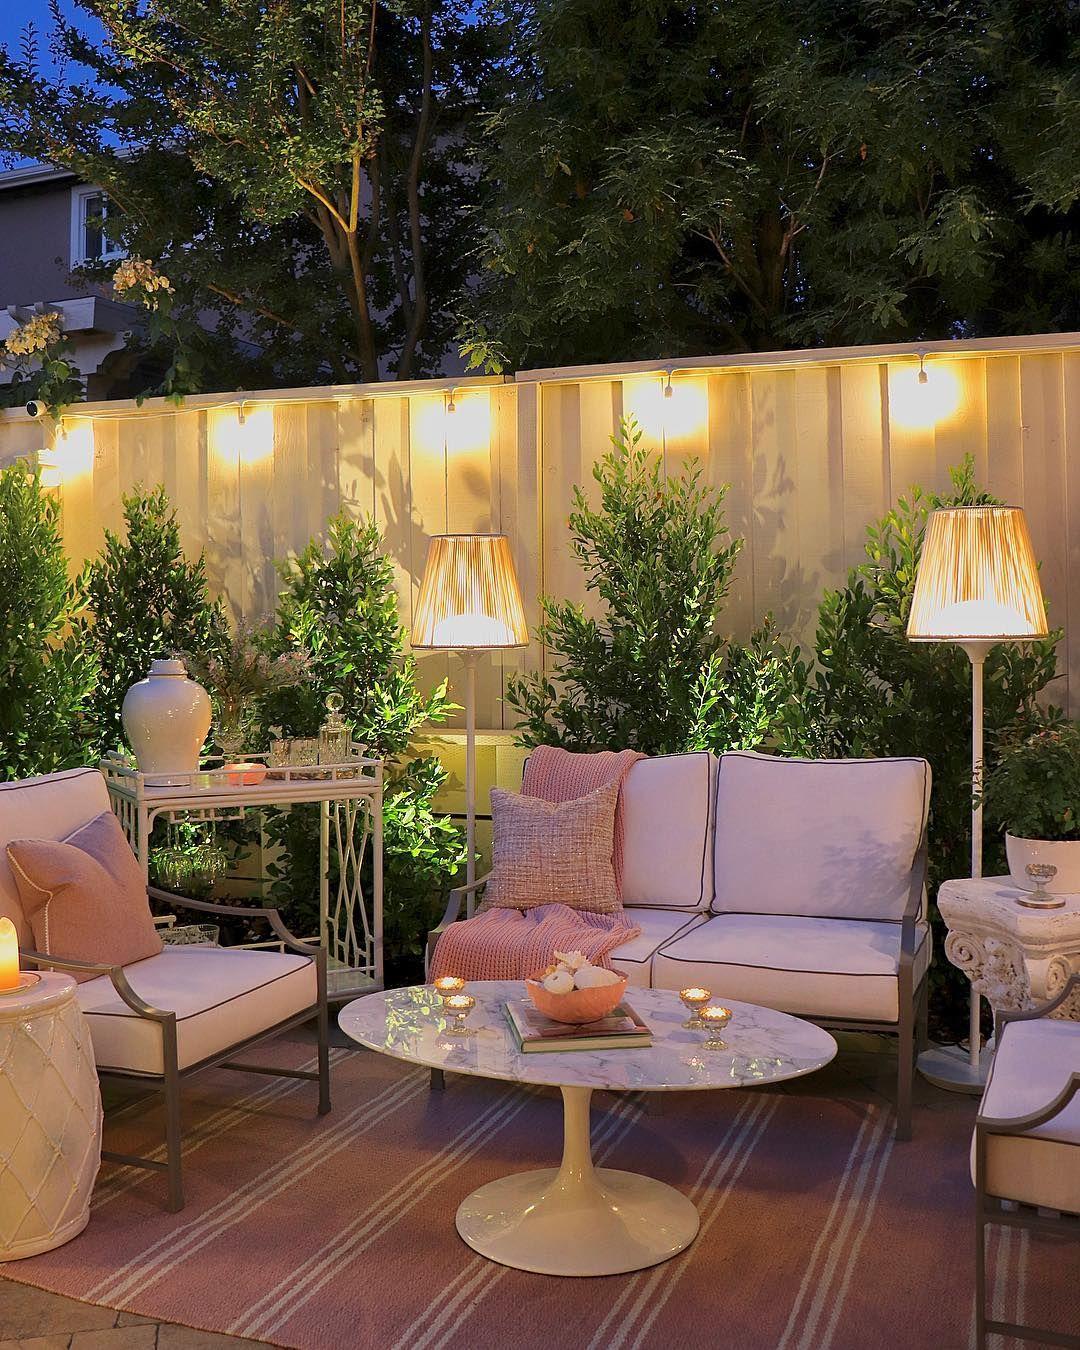 Extraordinary undefined #outdoor #backyard #backyardlandscaping #backyardgarden #smallbackyard